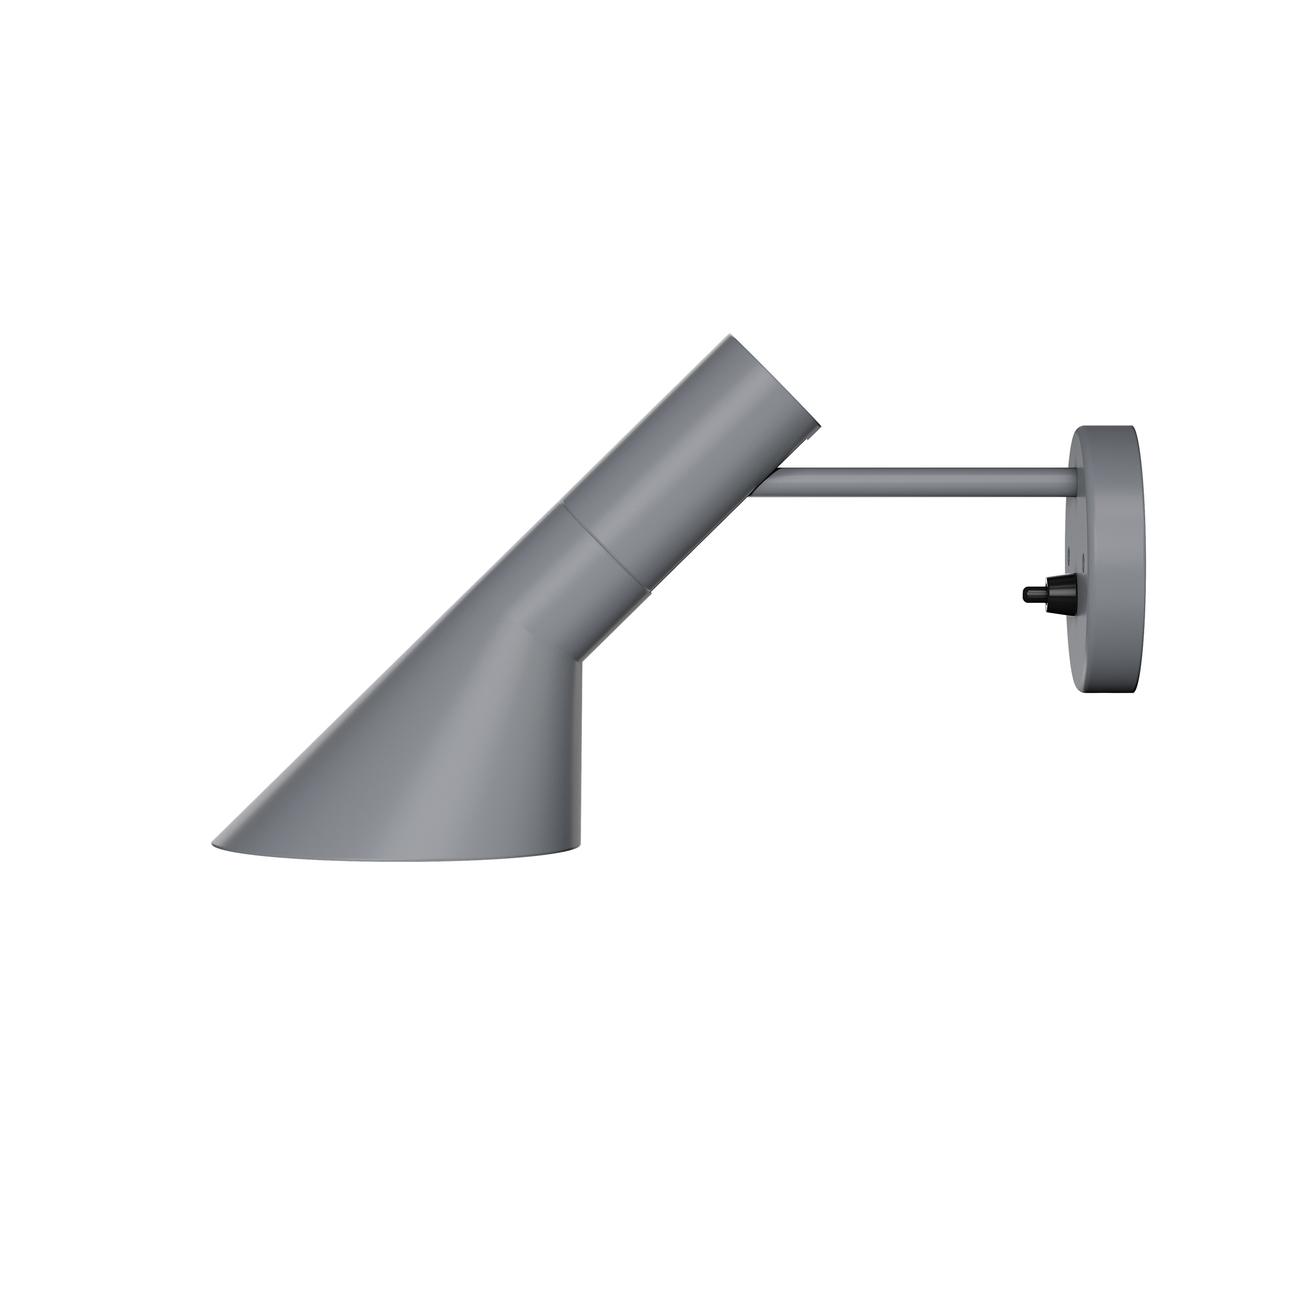 Louis Poulsen AJ wandlamp-Donker grijs